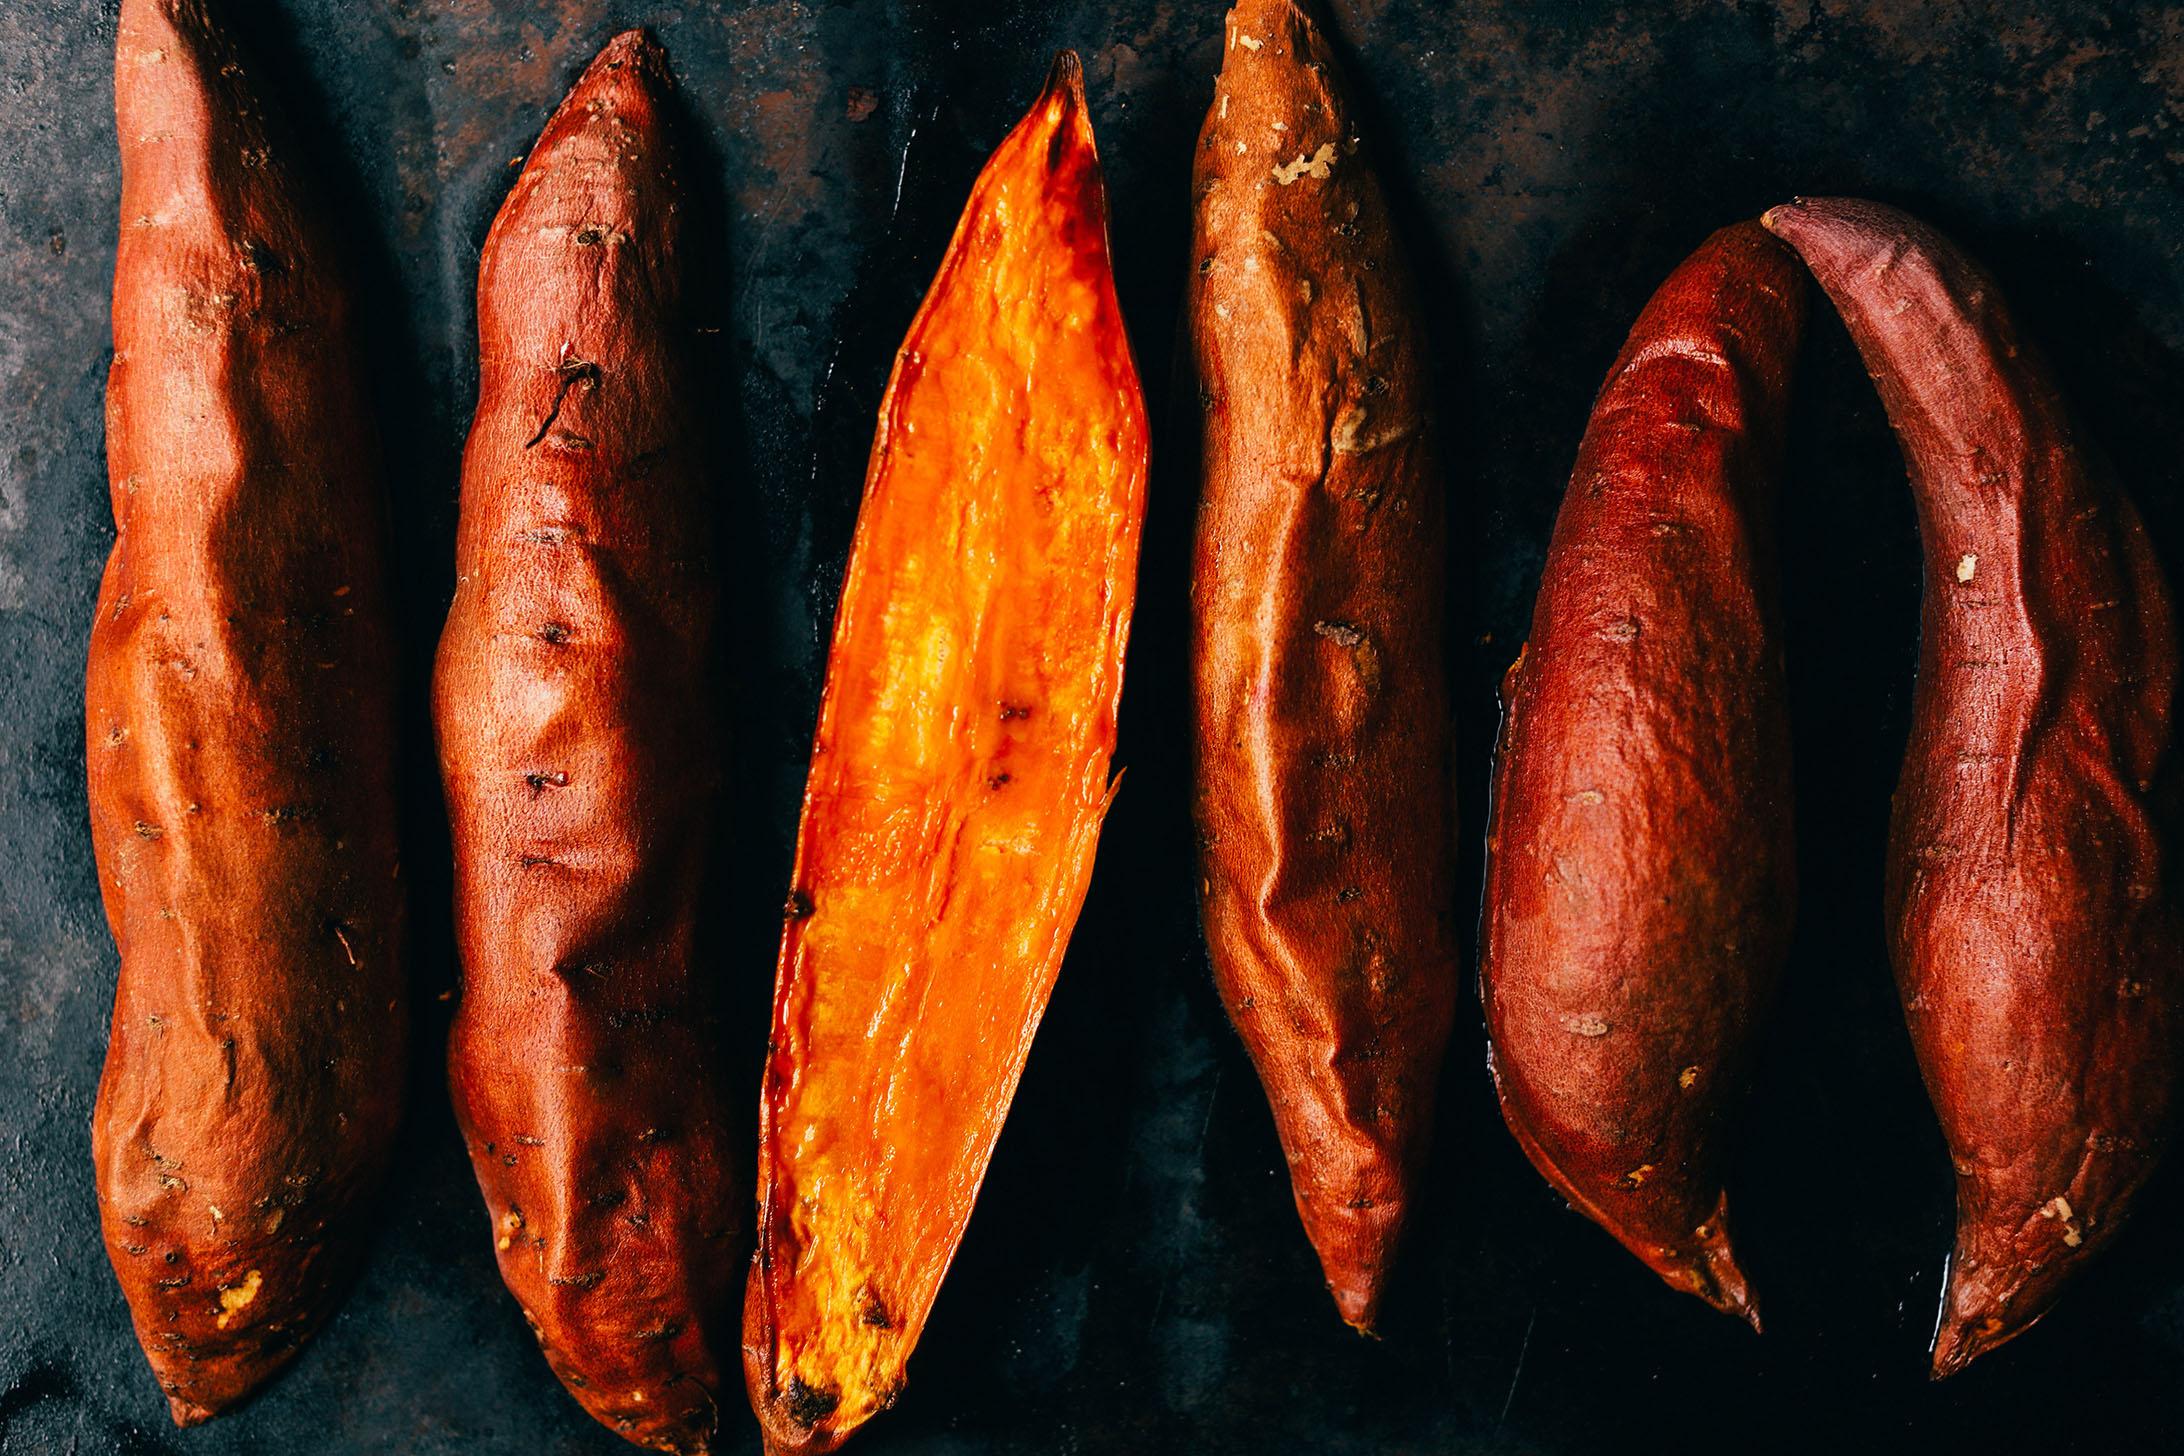 HEALTHY-Baked-Sweet-Potatoes-2-Ways-Savory-and-sweet-in-just-30-minutes-vegan-glutenfree-sweetpotato-healthy-minimalistbaker-plantbased.jpg